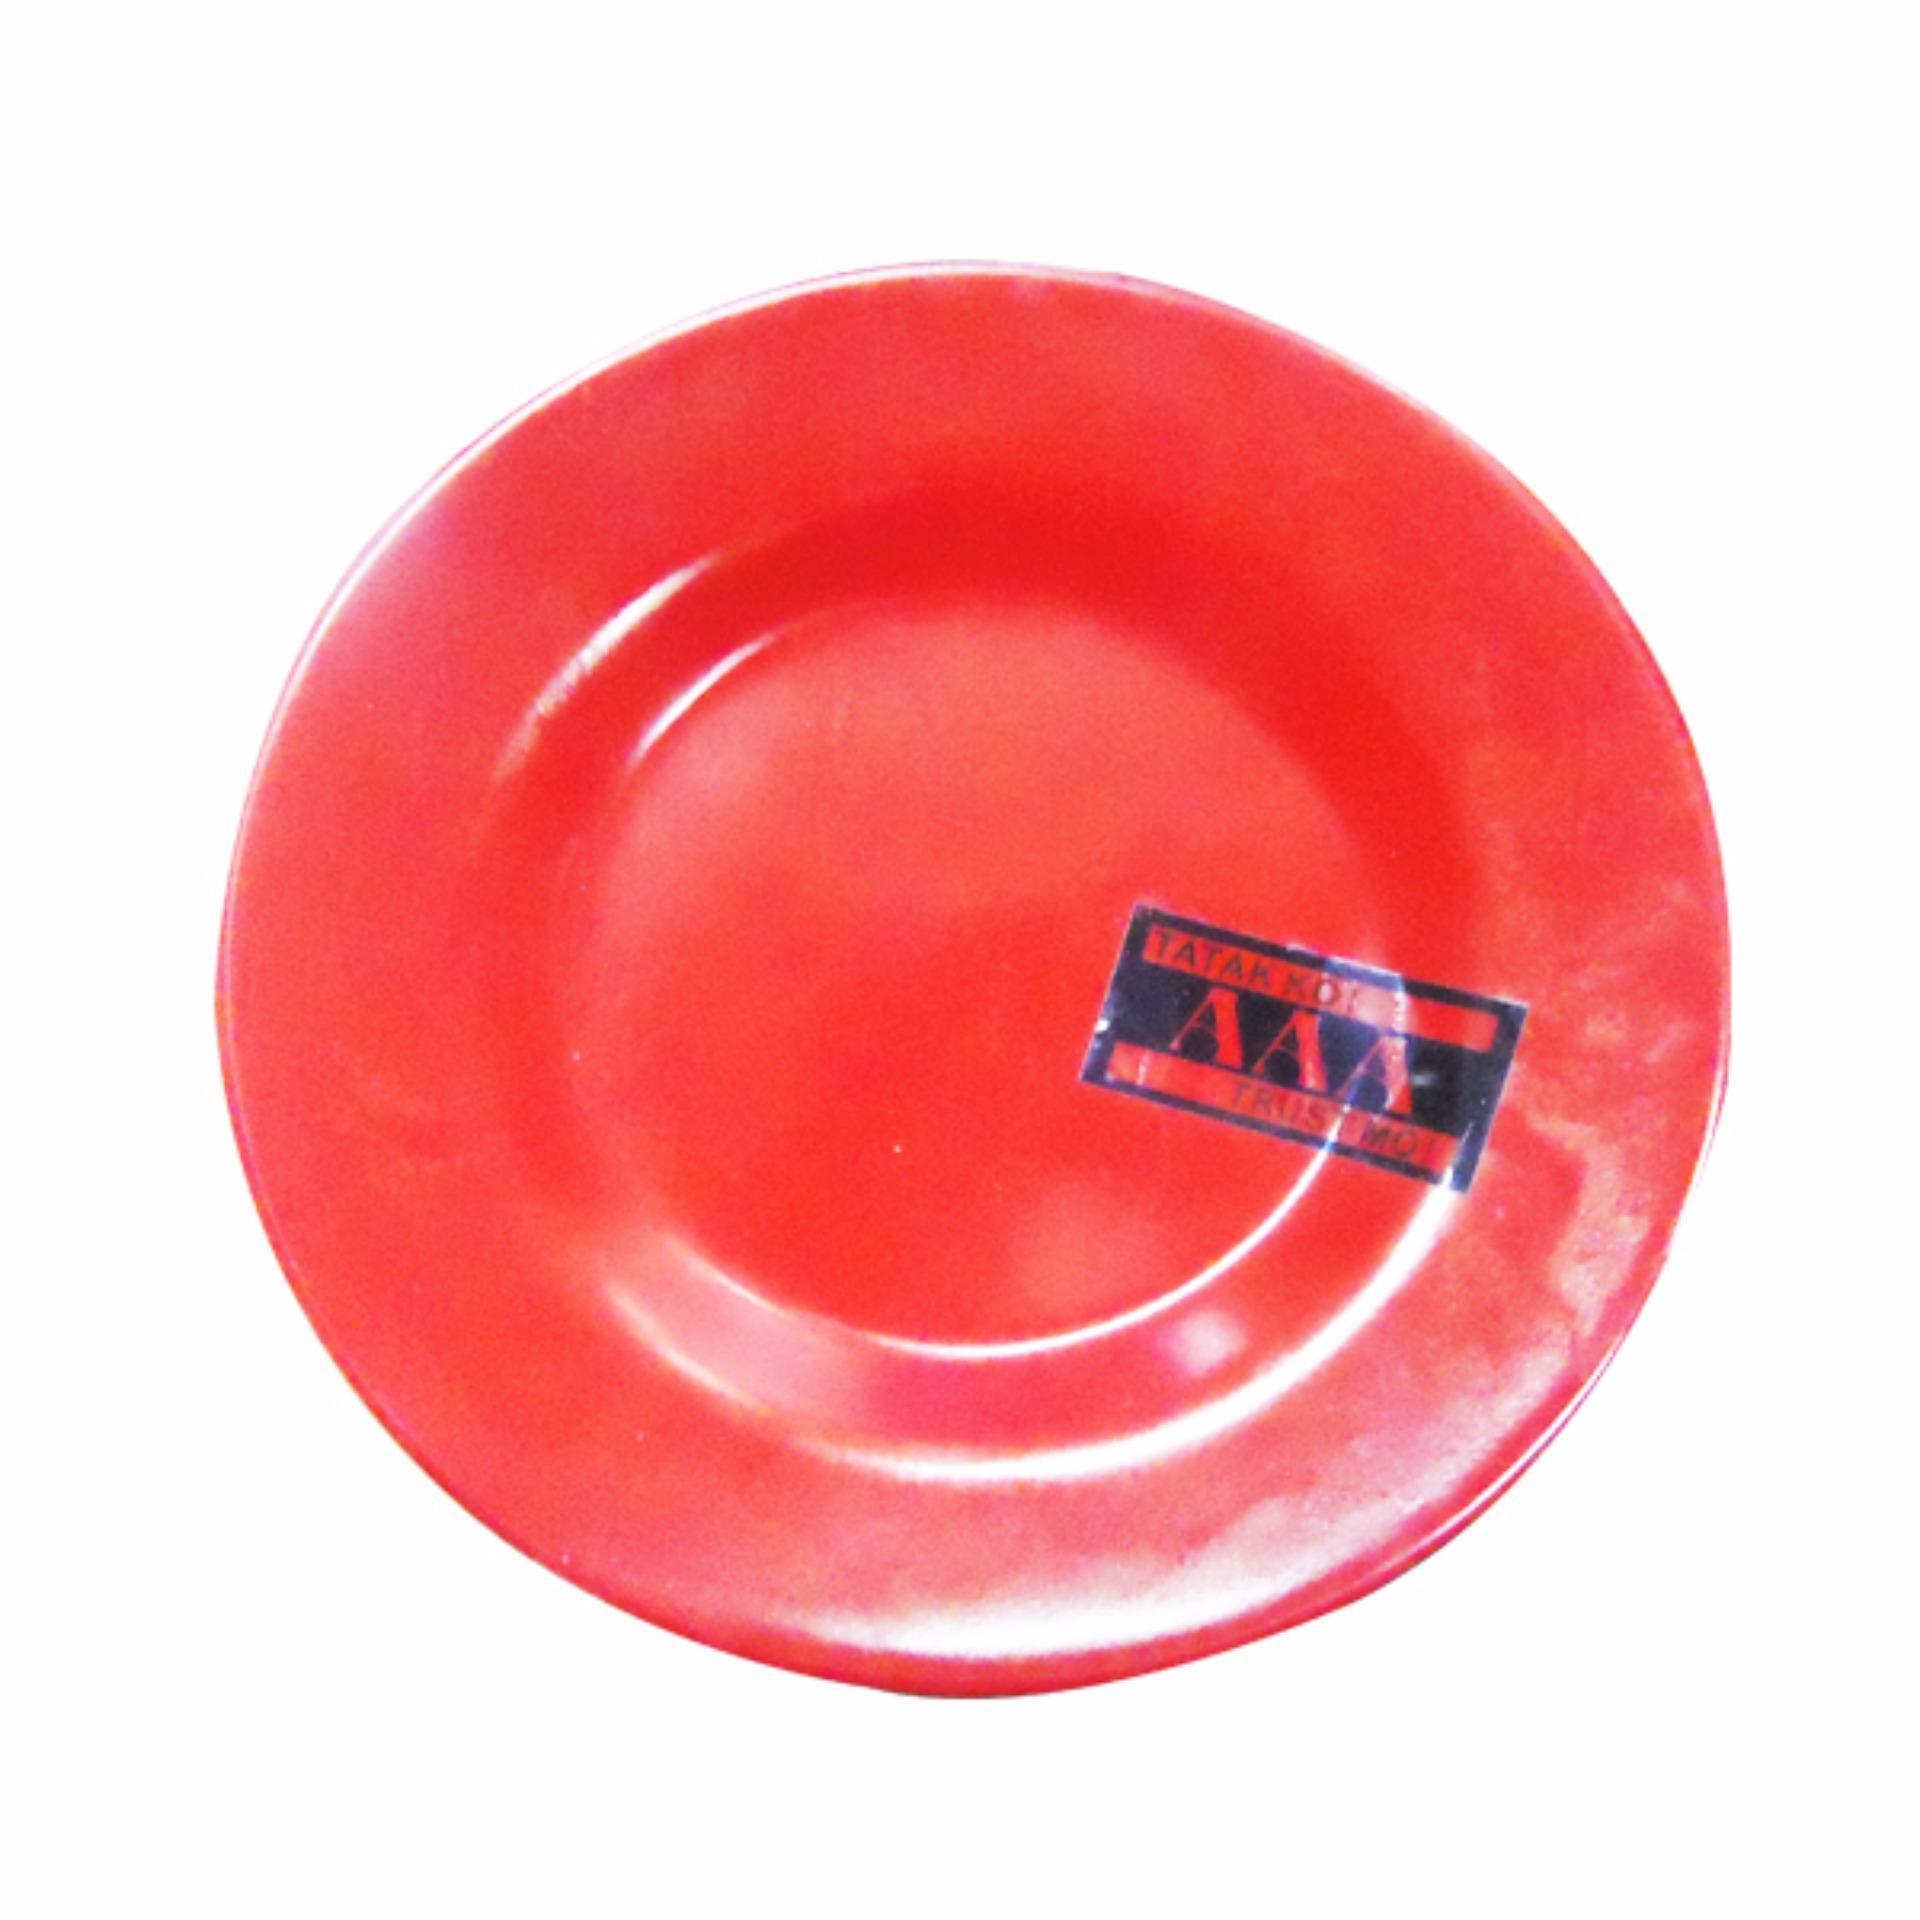 Homex Saucer Plate No.255 Set 6pcs